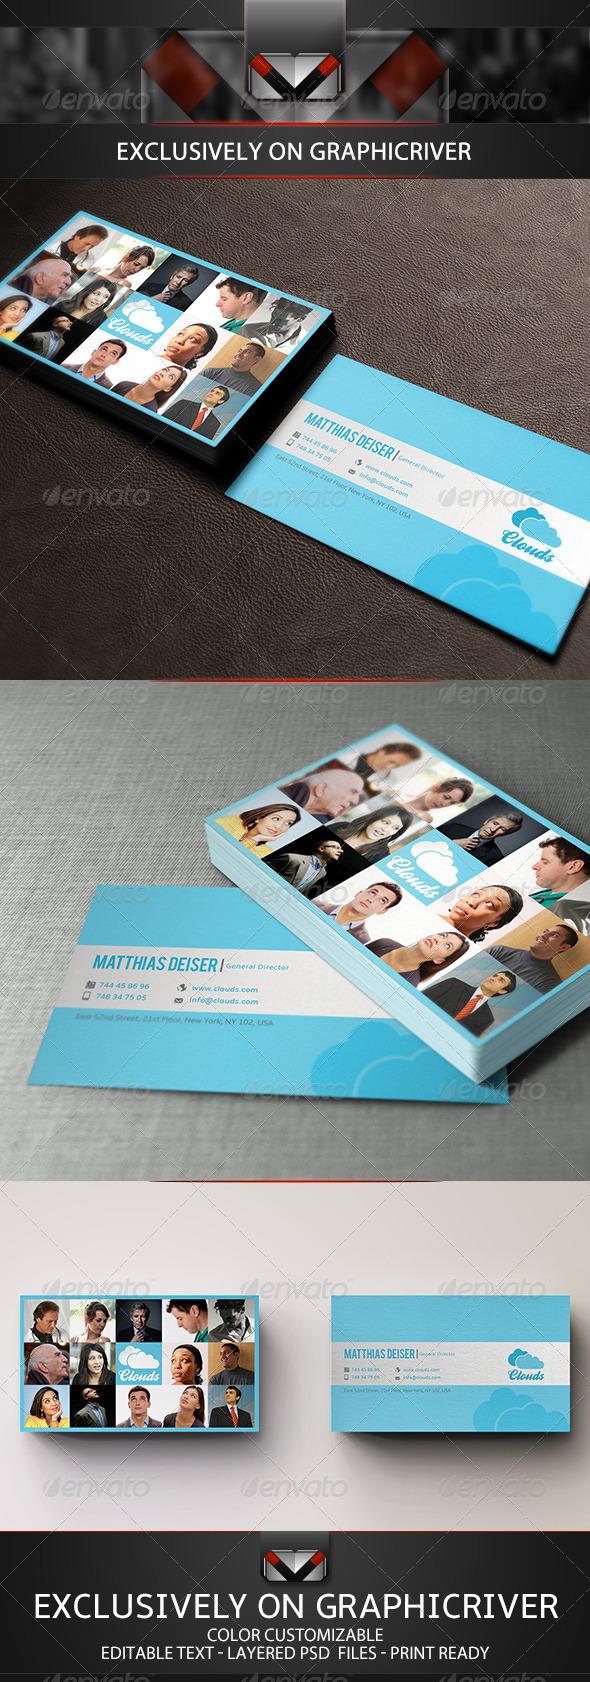 GraphicRiver Blue Business Card 5316277